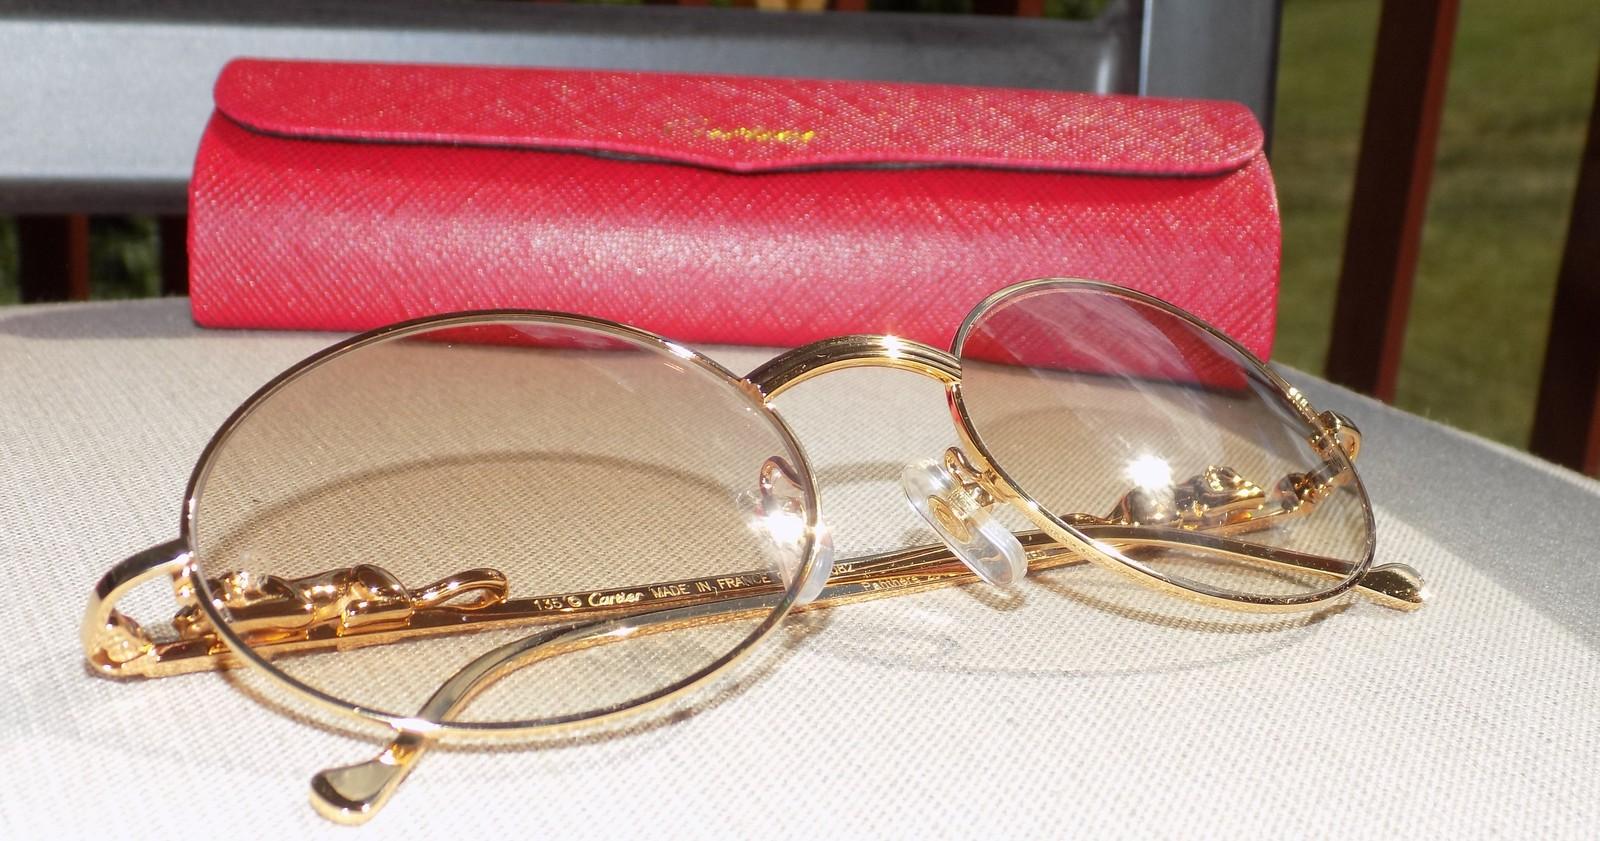 743a5bbce37e Dscn2572. Dscn2572. Previous. Cartier Custom Panther Series 2012 Oval Lens Buffalo  Sunglasses